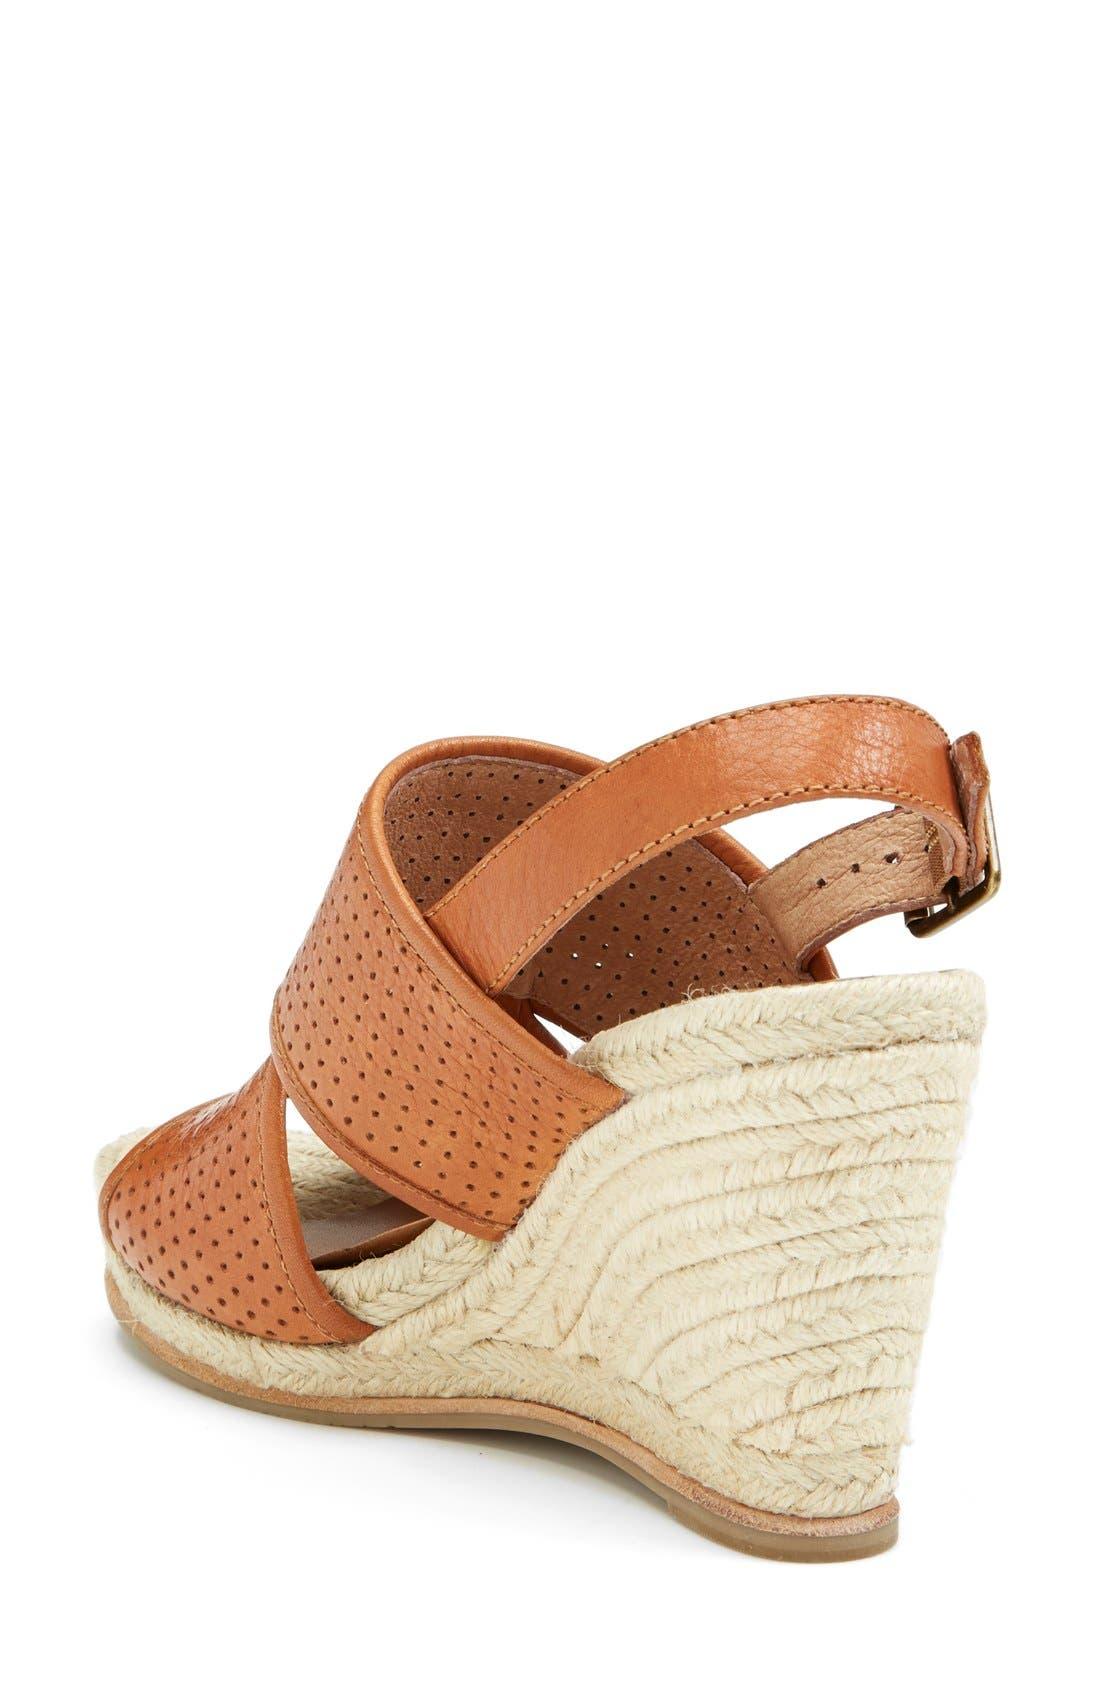 'Joyce' Perforated Espadrille Wedge Sandal,                             Alternate thumbnail 2, color,                             Brown